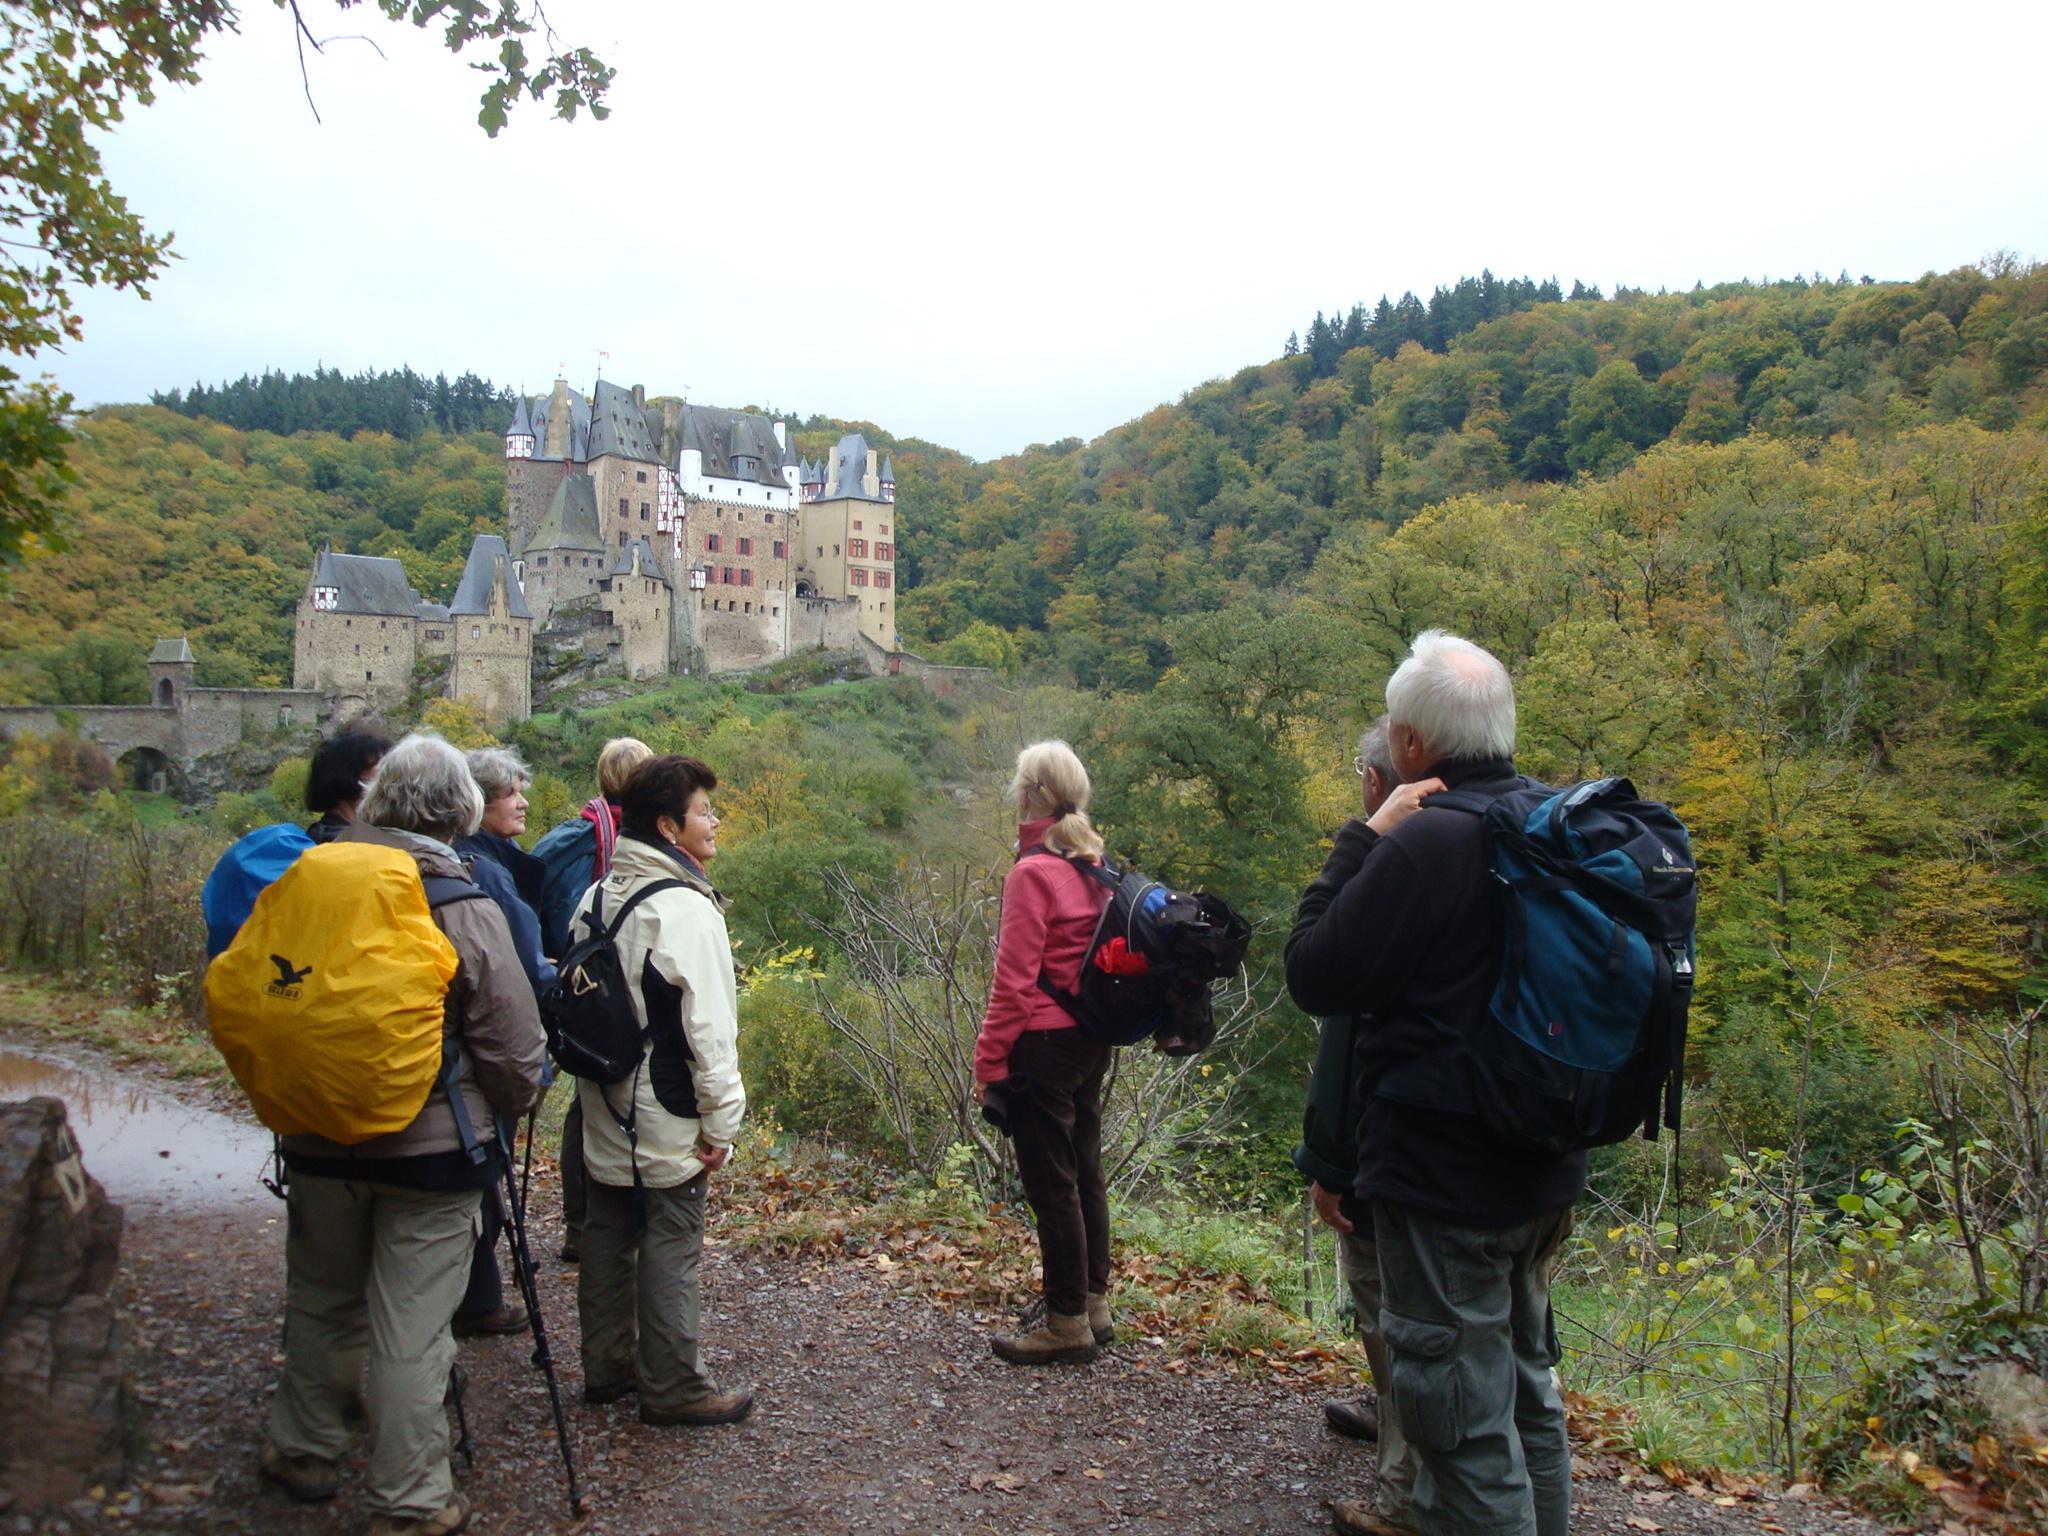 2012 - Etappenwanderung: Ankunft an Burg Elz